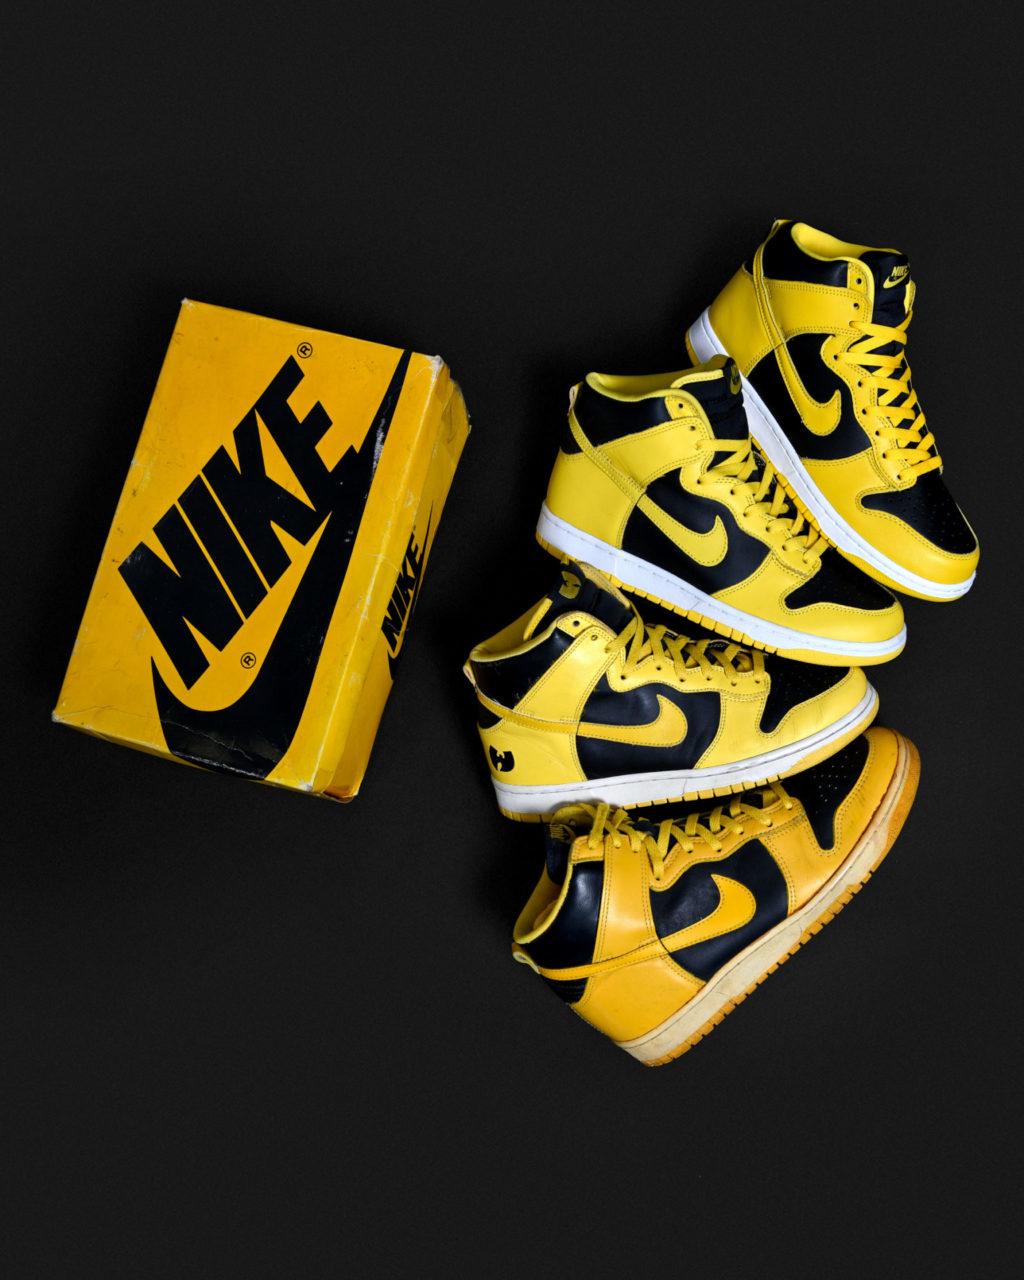 Nike Dunk High Varsity Maize